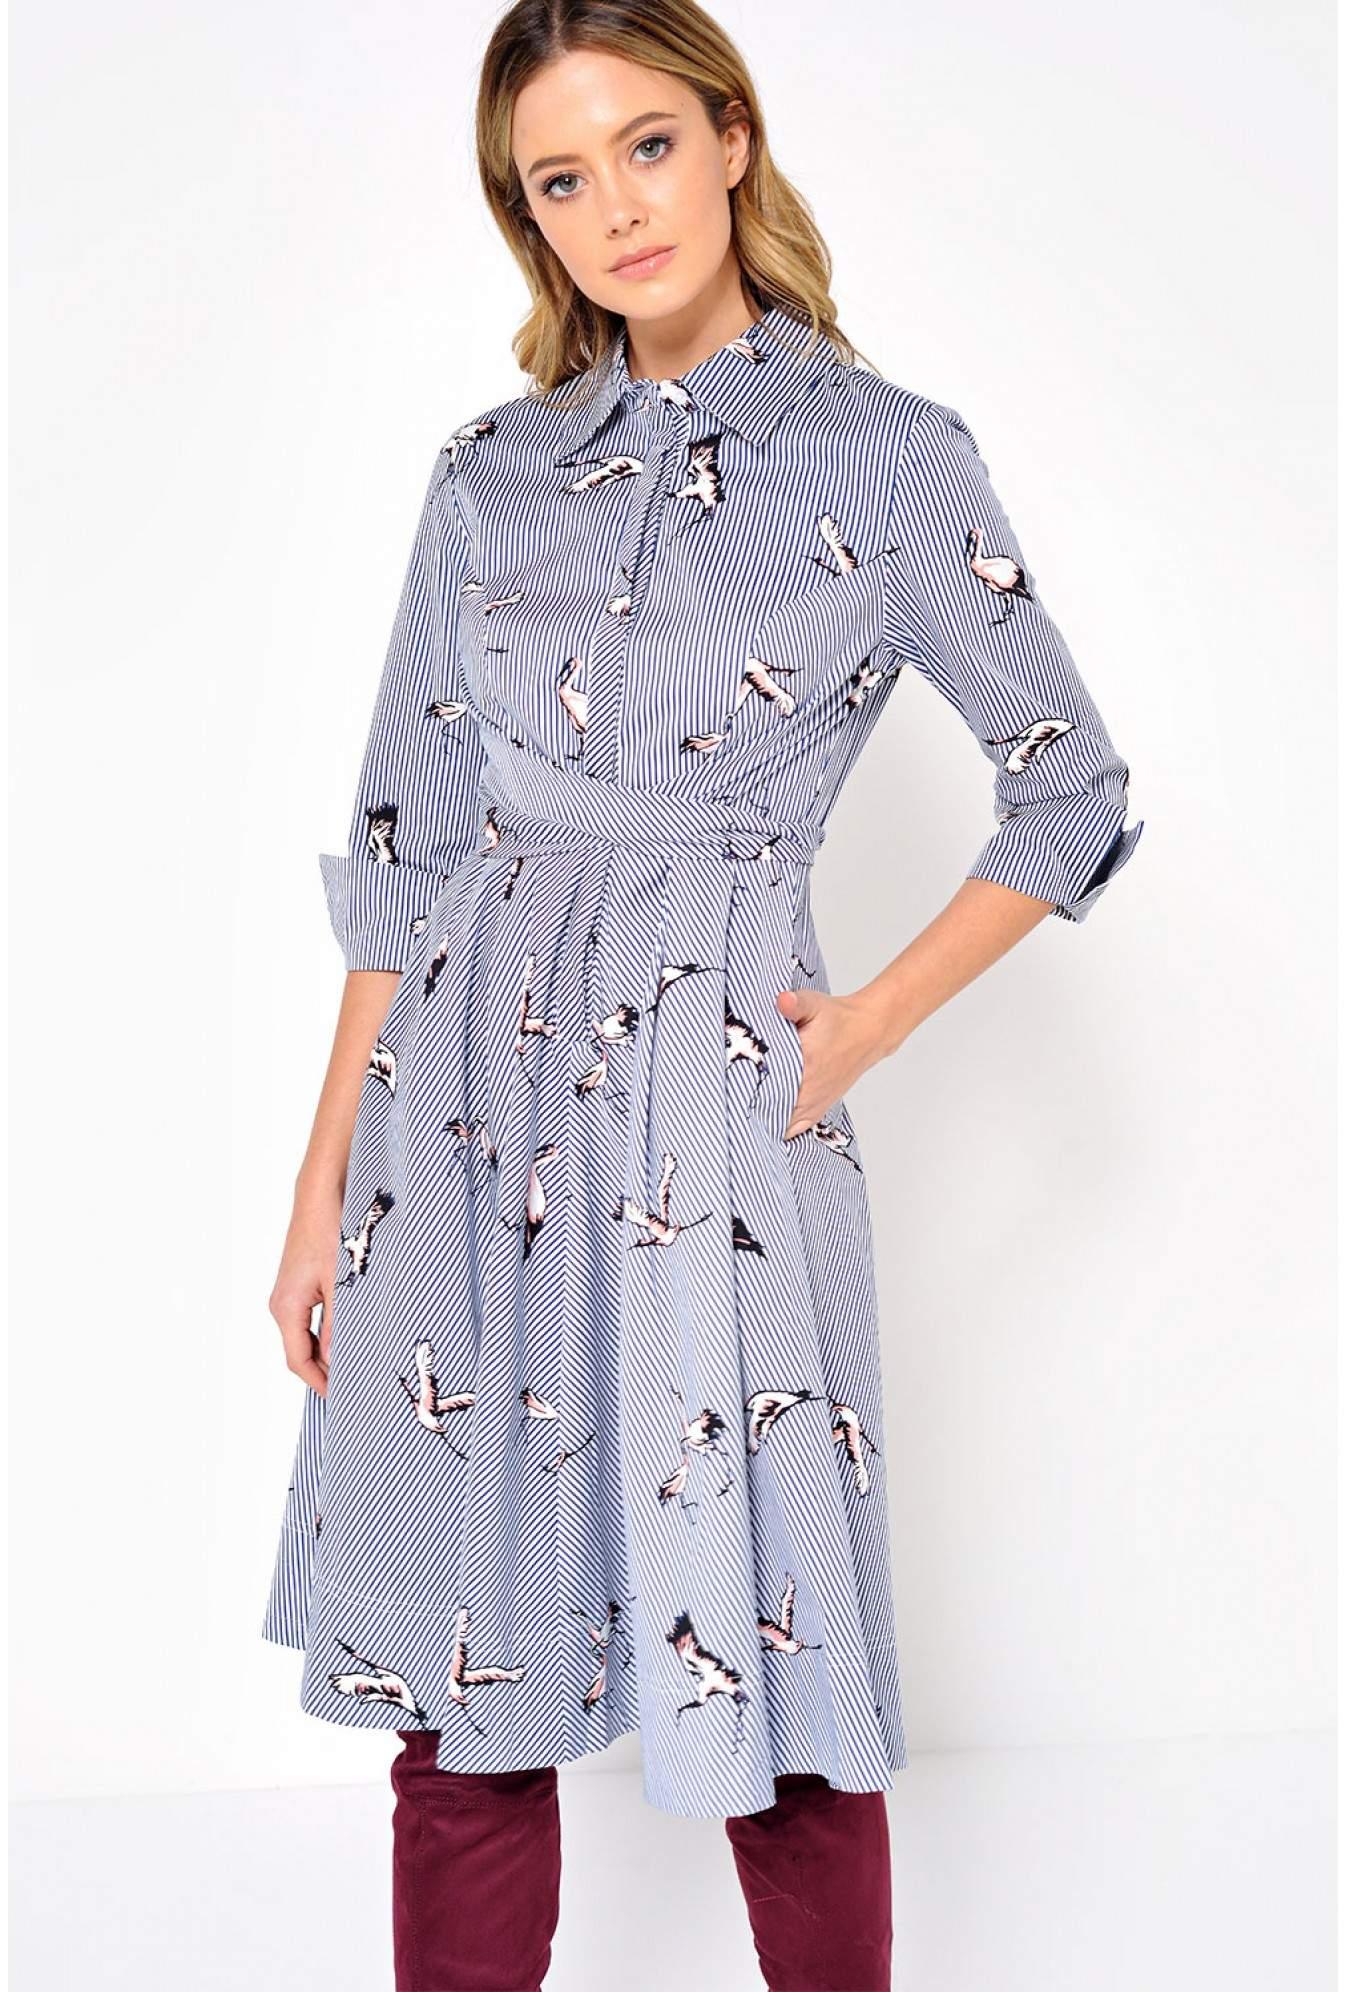 bc70928a1 Stella Kellice Bird Stripe Shirt Dress | iCLOTHING